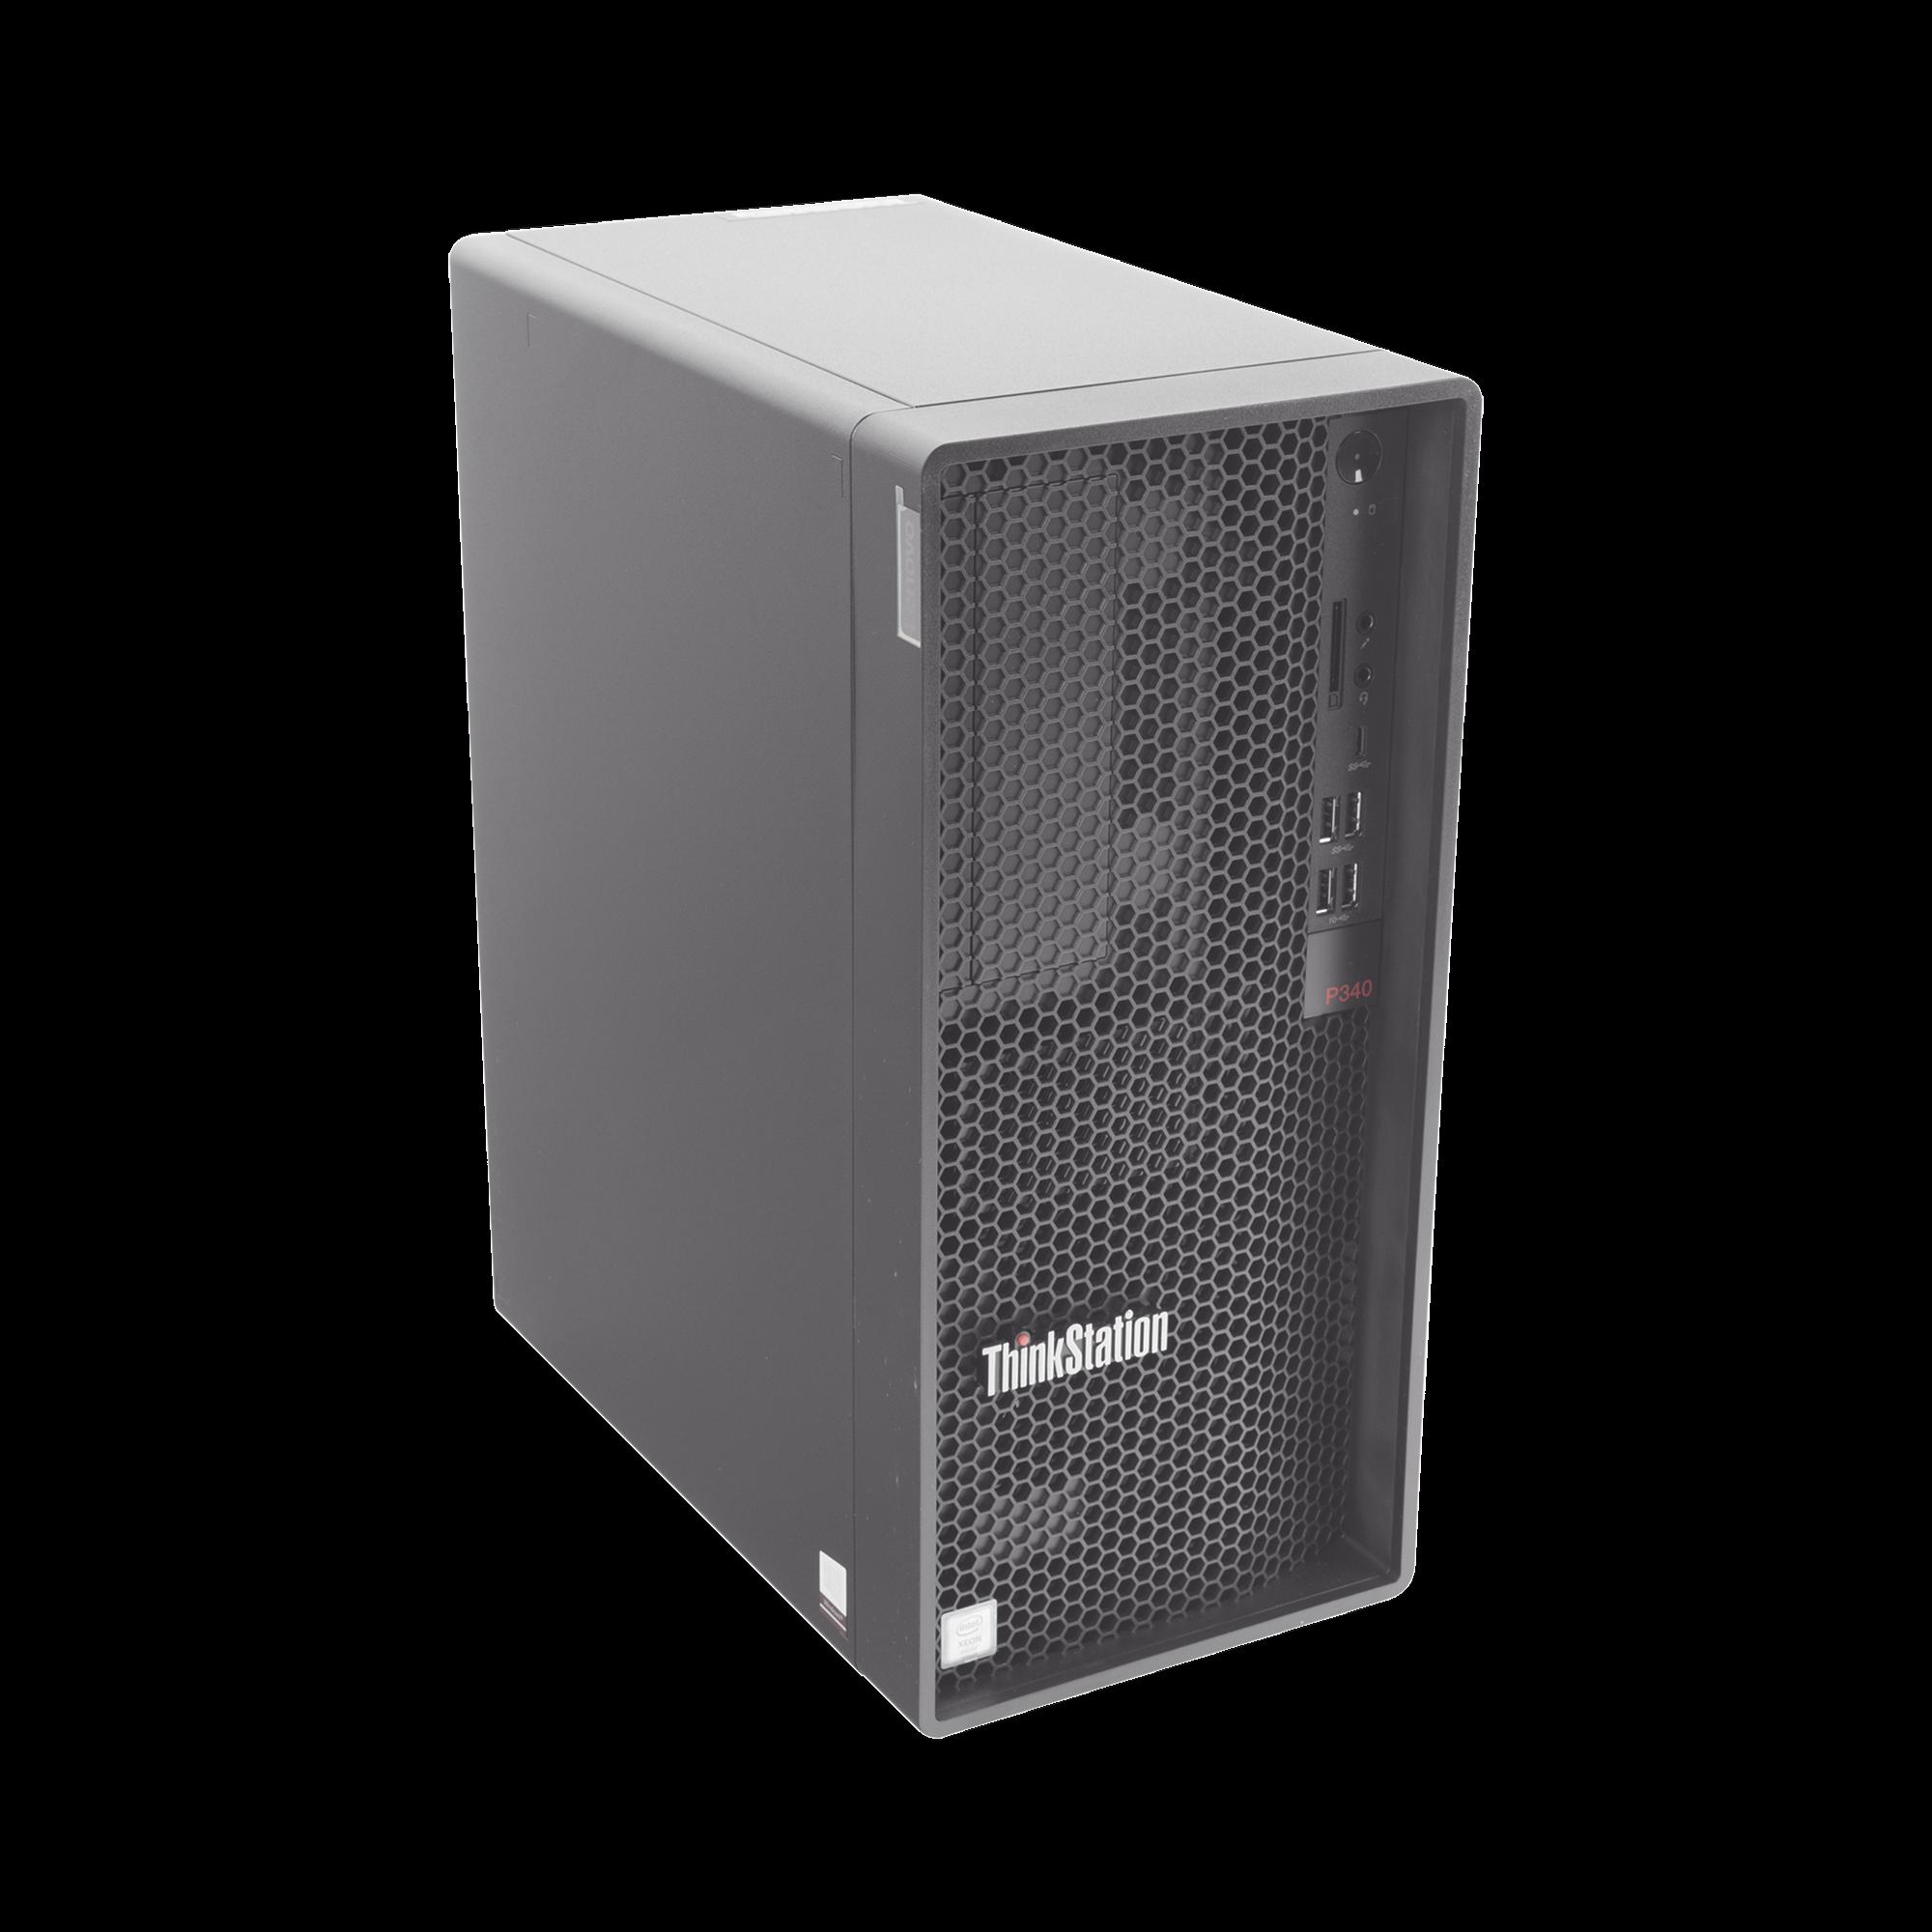 Estación de trabajo LENOVO / Xeon / 16GB / Win10